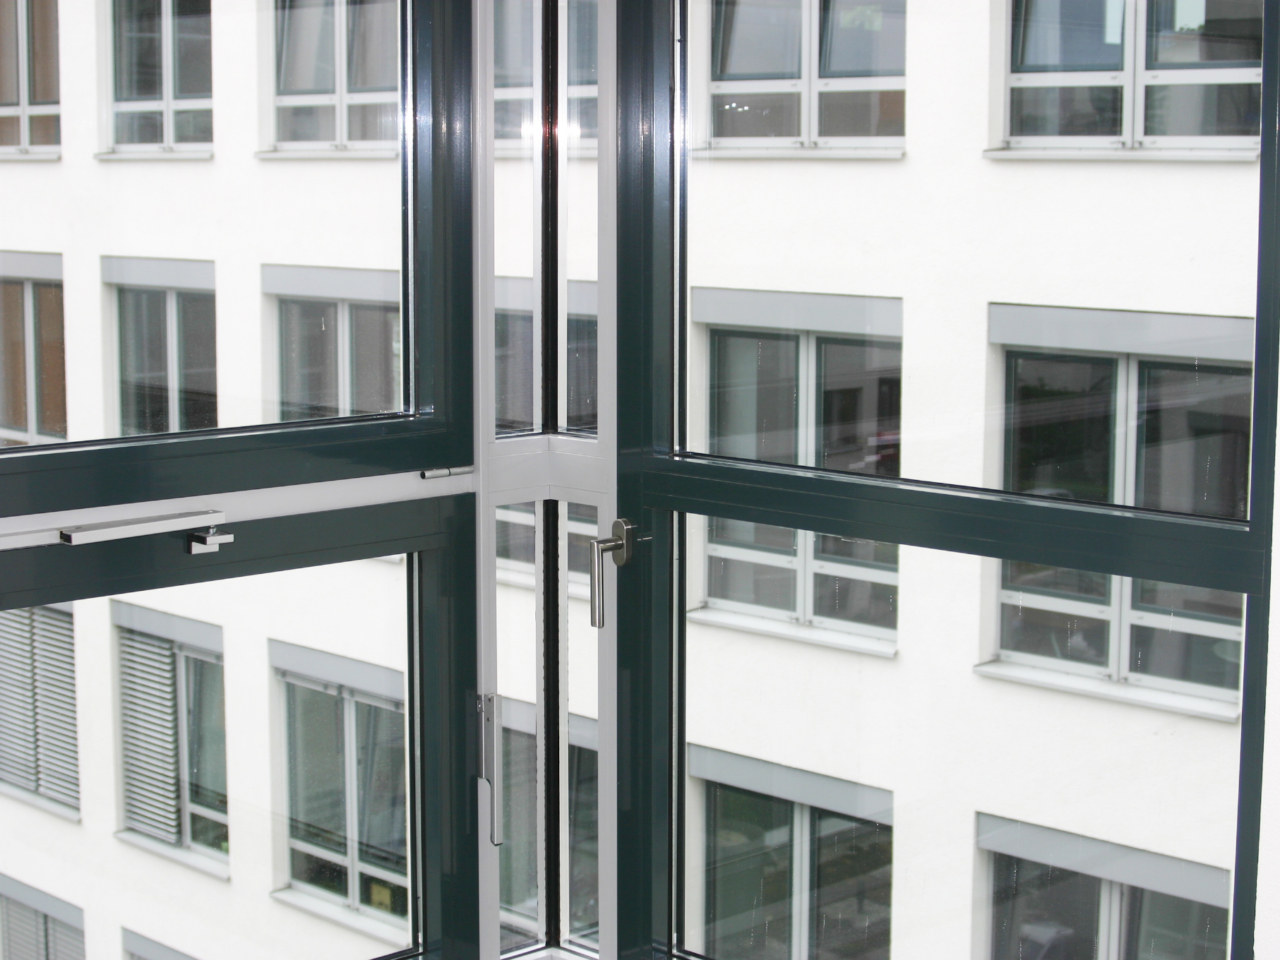 Treppenhaus Bürogebäude Hugenottenalle Neu-Isenburg